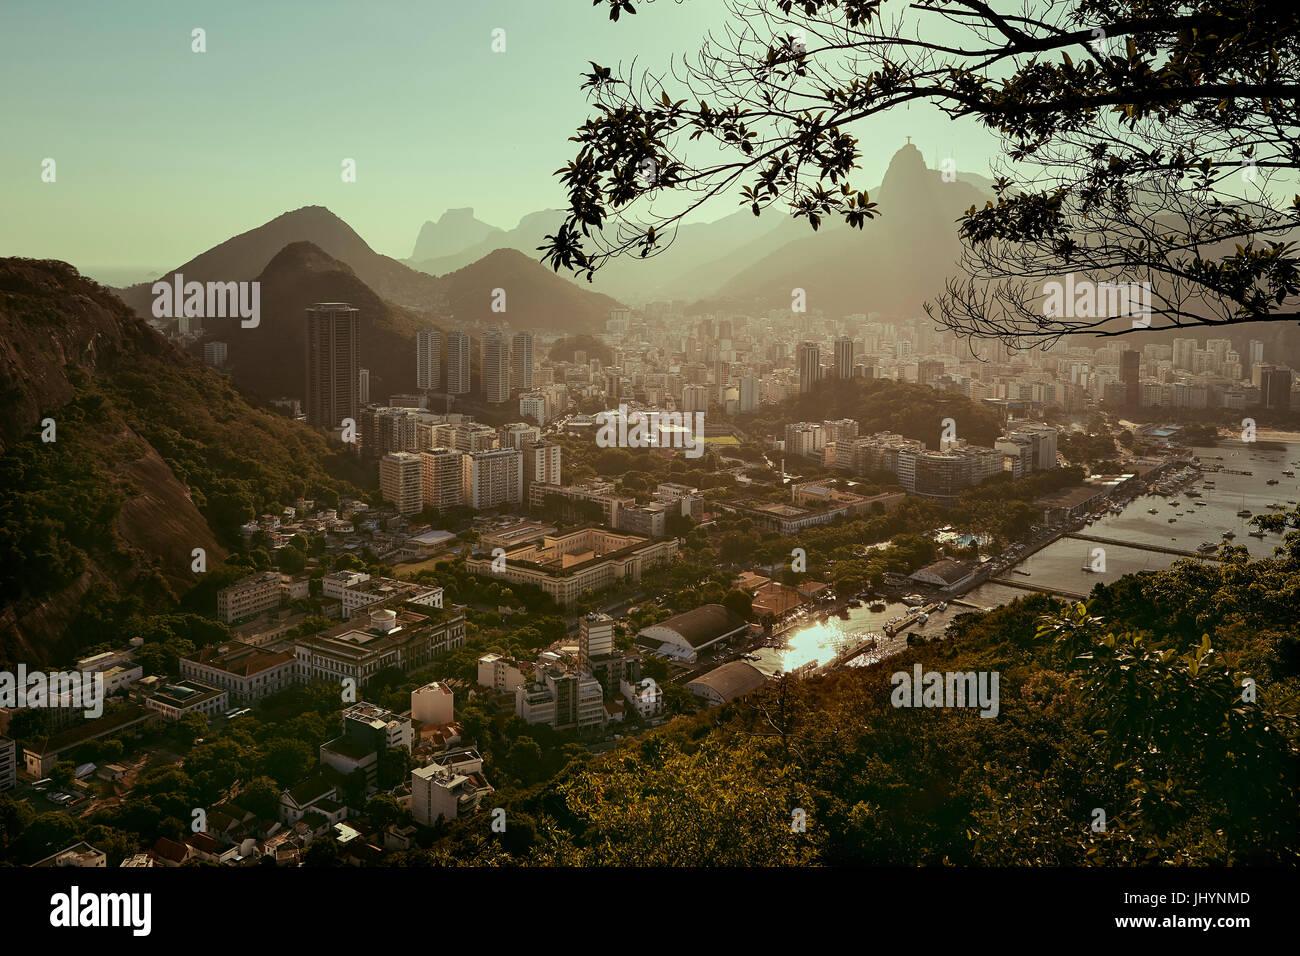 Vedute di Rio de Janeiro e Cristo redentore da Sugarloaf mountain (Pao de Acuca) al tramonto, Rio de Janeiro, Brasile Immagini Stock